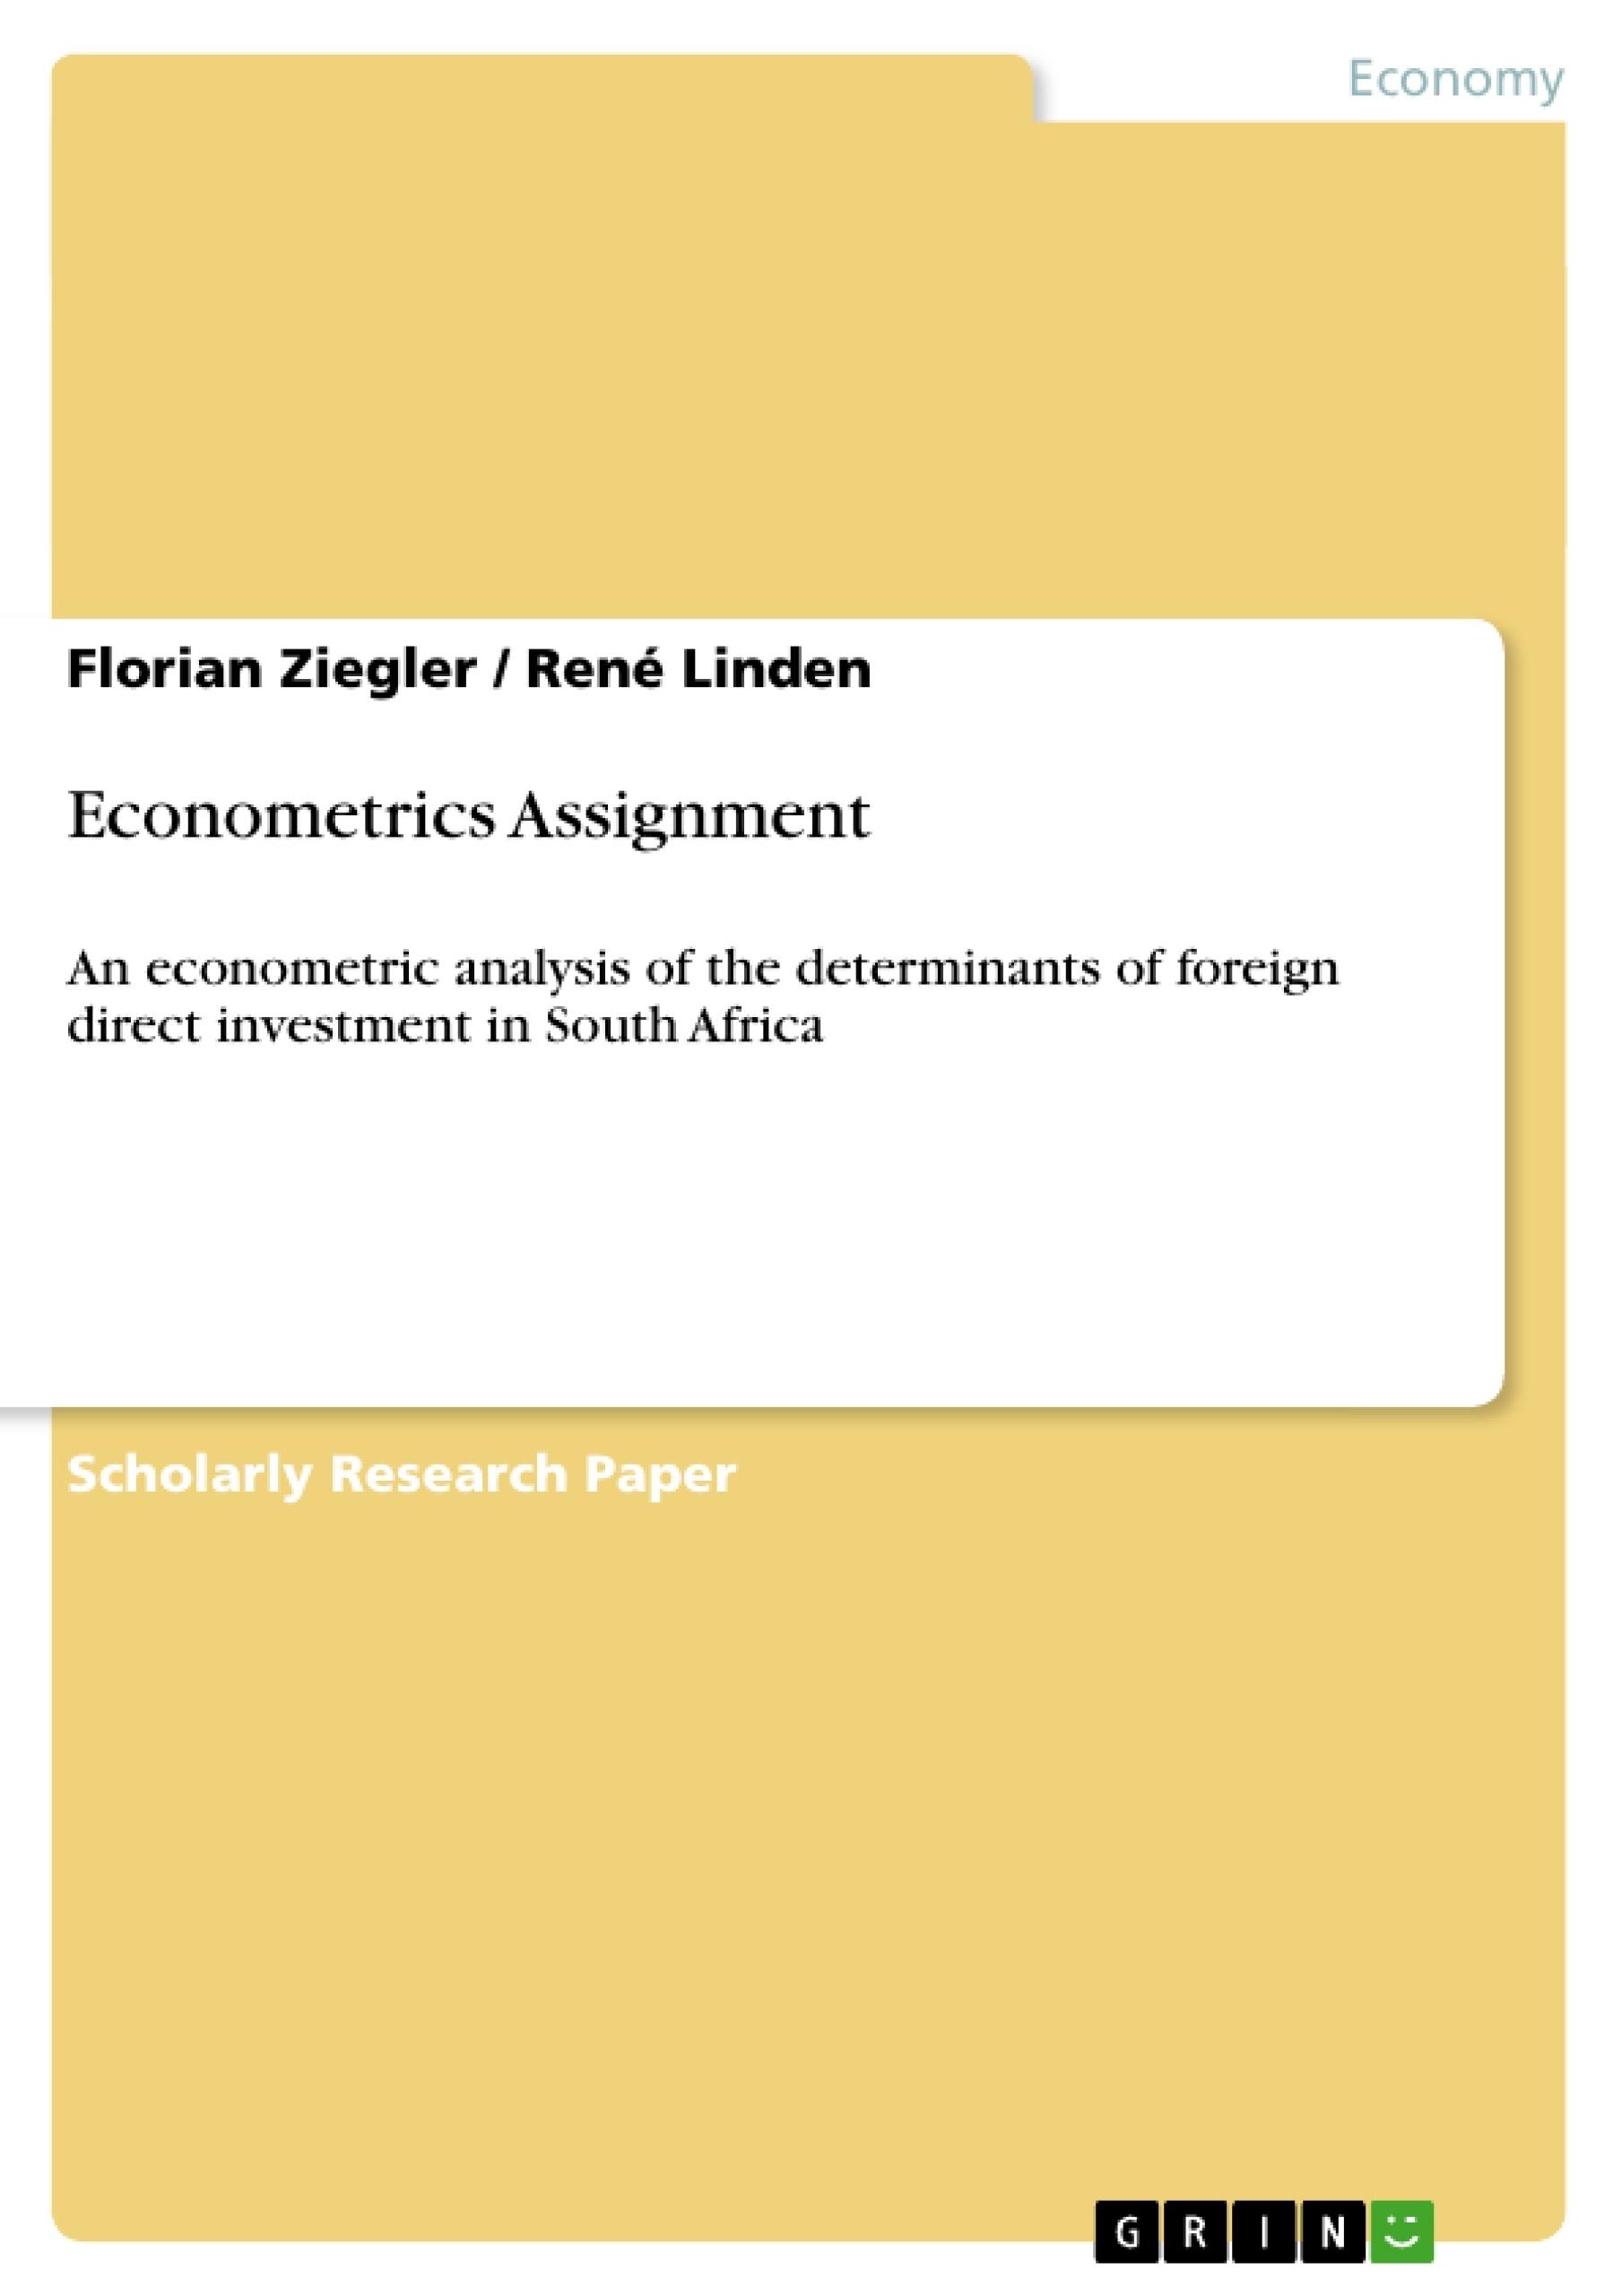 Title: Econometrics Assignment